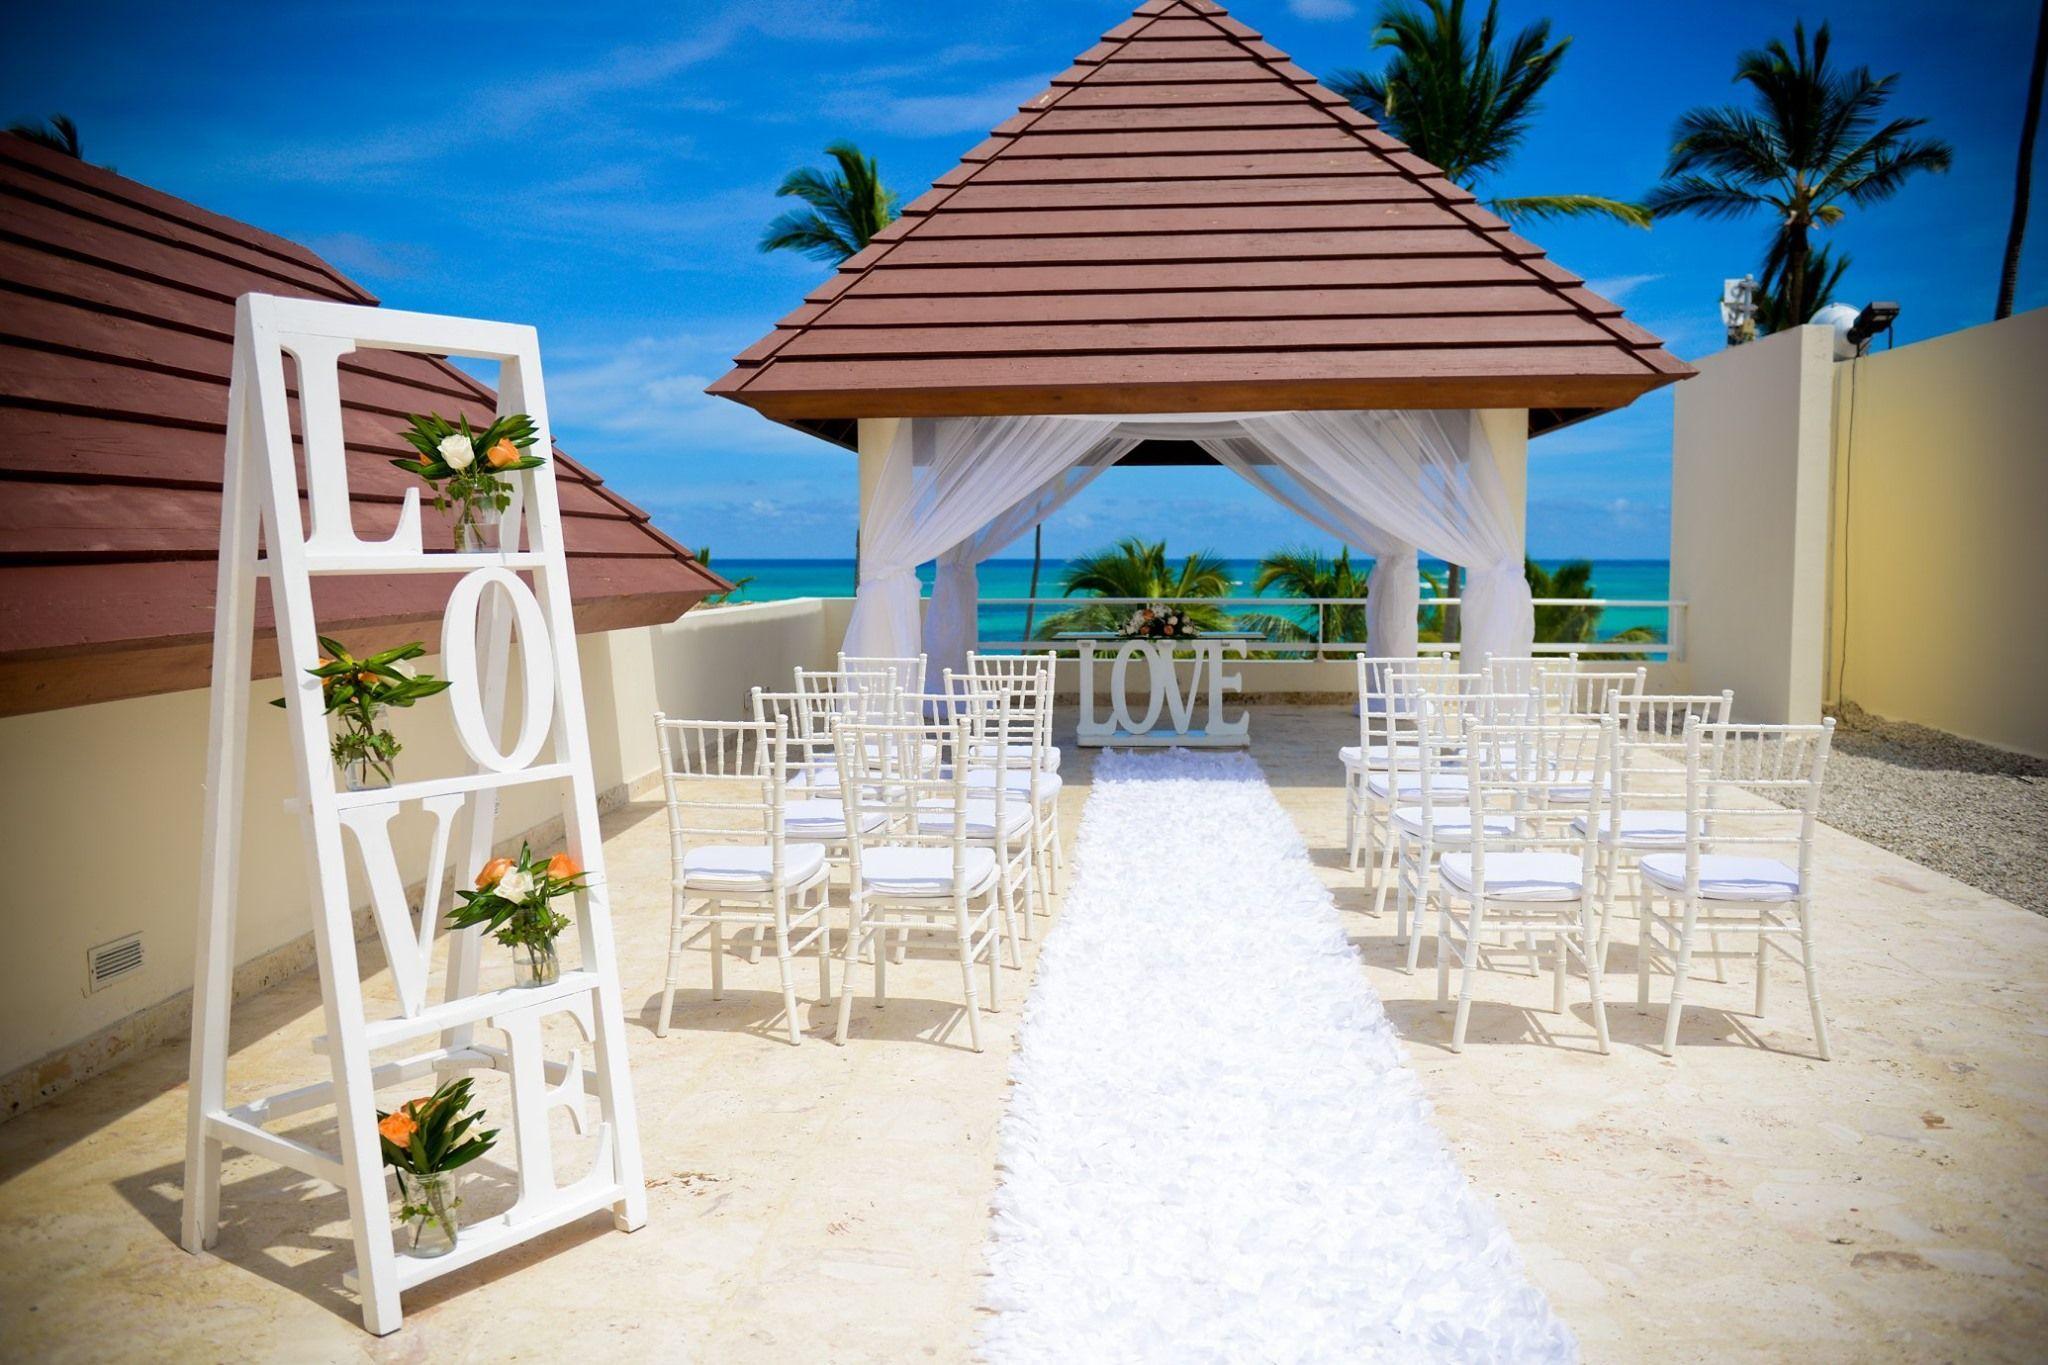 Plan The Perfect Destination Wedding At Now Larimar Now Larimar Now Larimar Punta Cana Dominican Republic Resorts